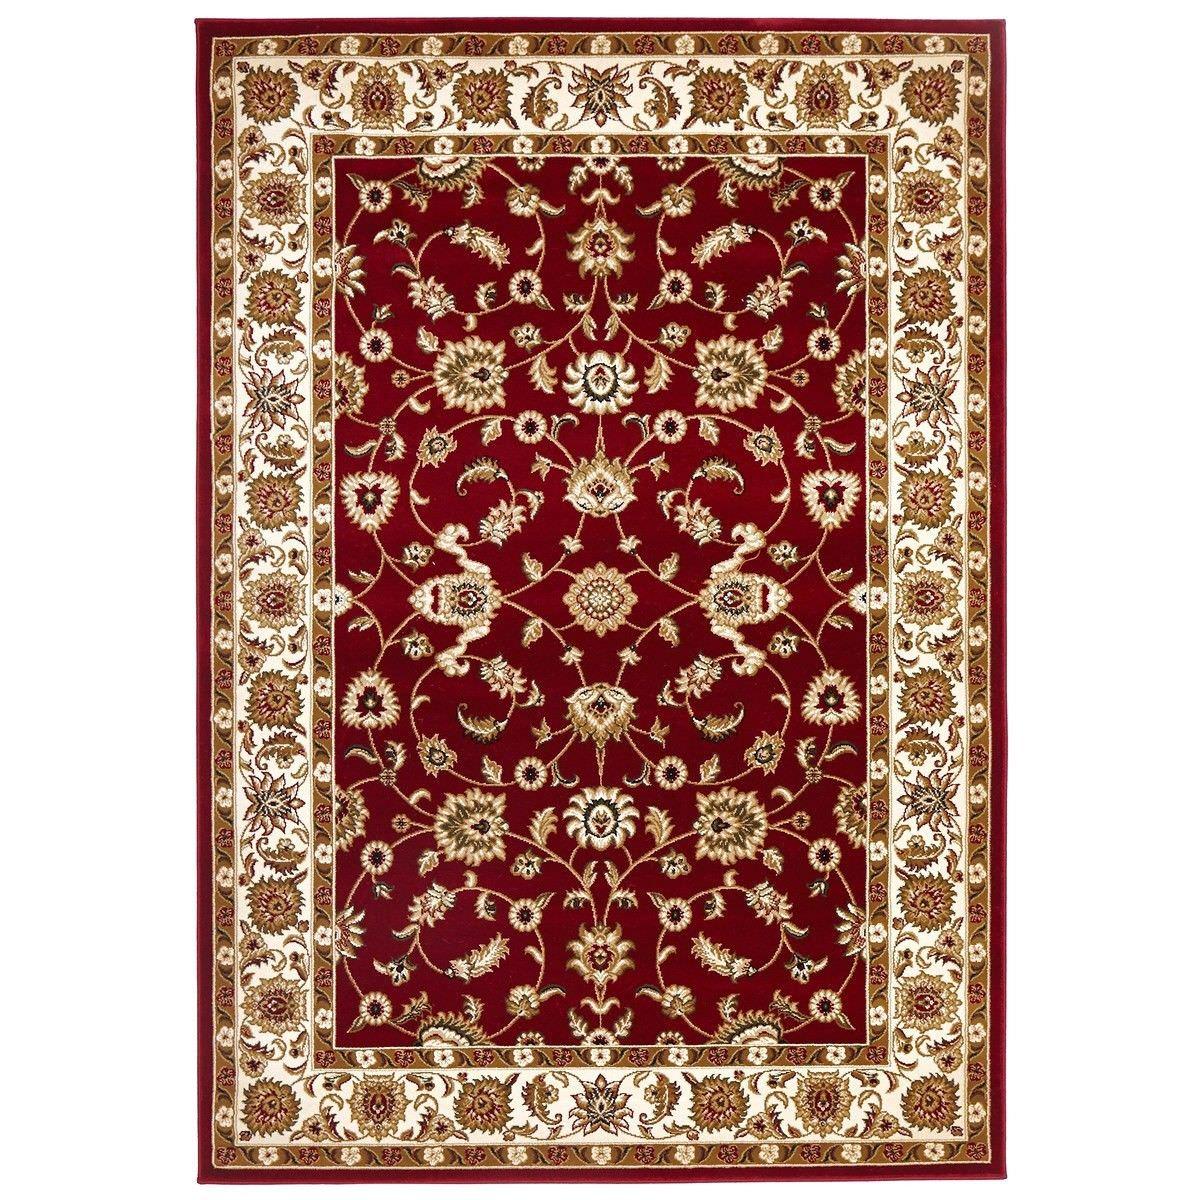 Turkish Rug Au: Sydney Classic Turkish Made Oriental Rug, 230x160cm, Red